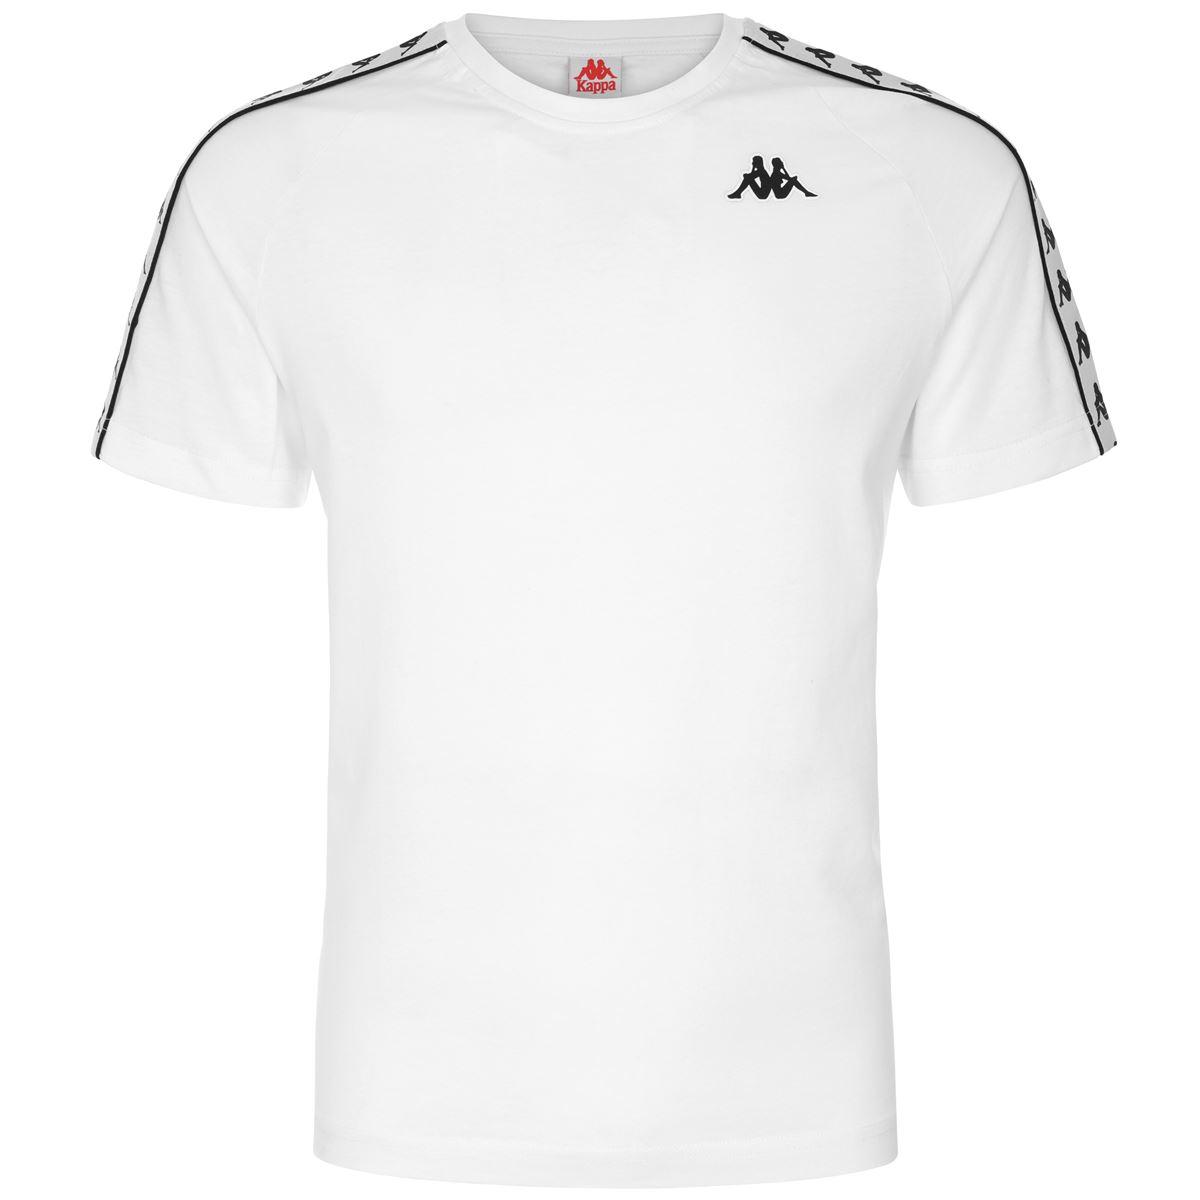 T-shirt Kappa KAPPA   T-shirt   303UV10A99